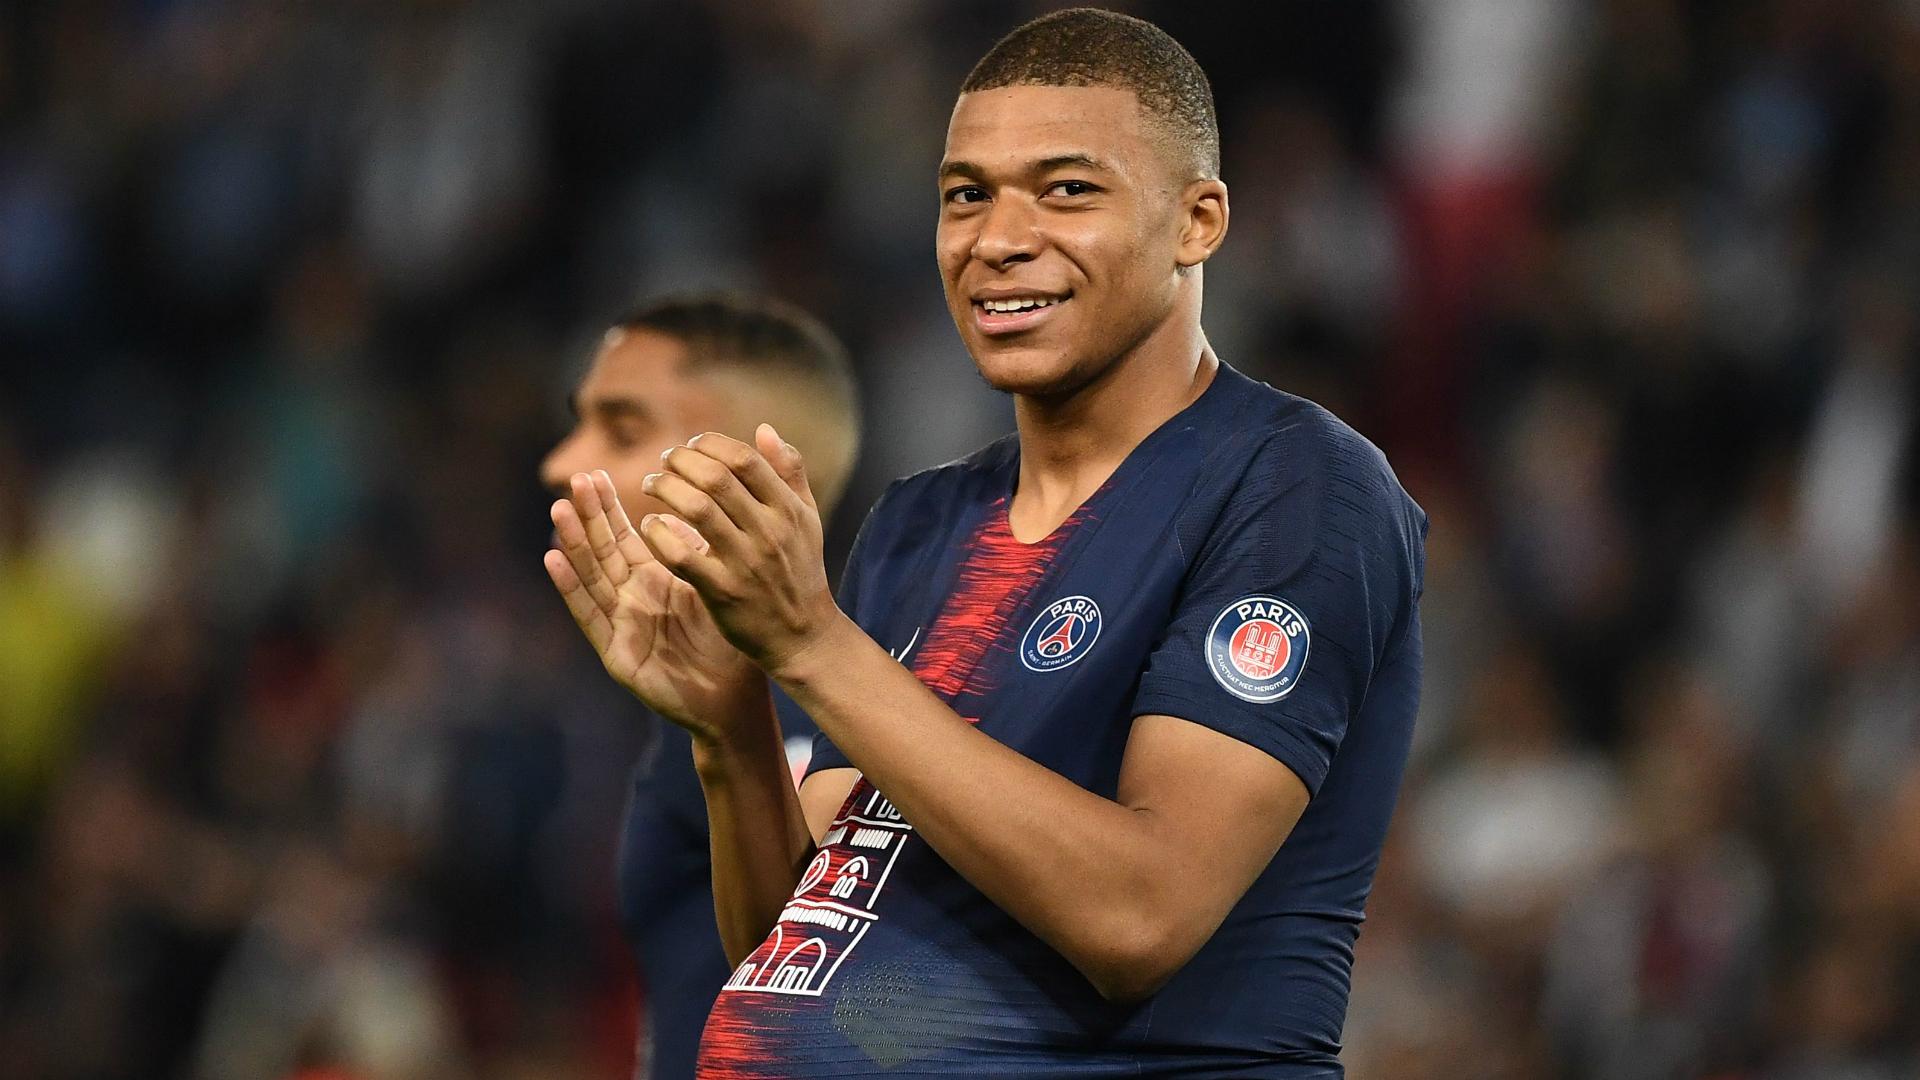 Mbappe won't leave PSG, insists Tuchel